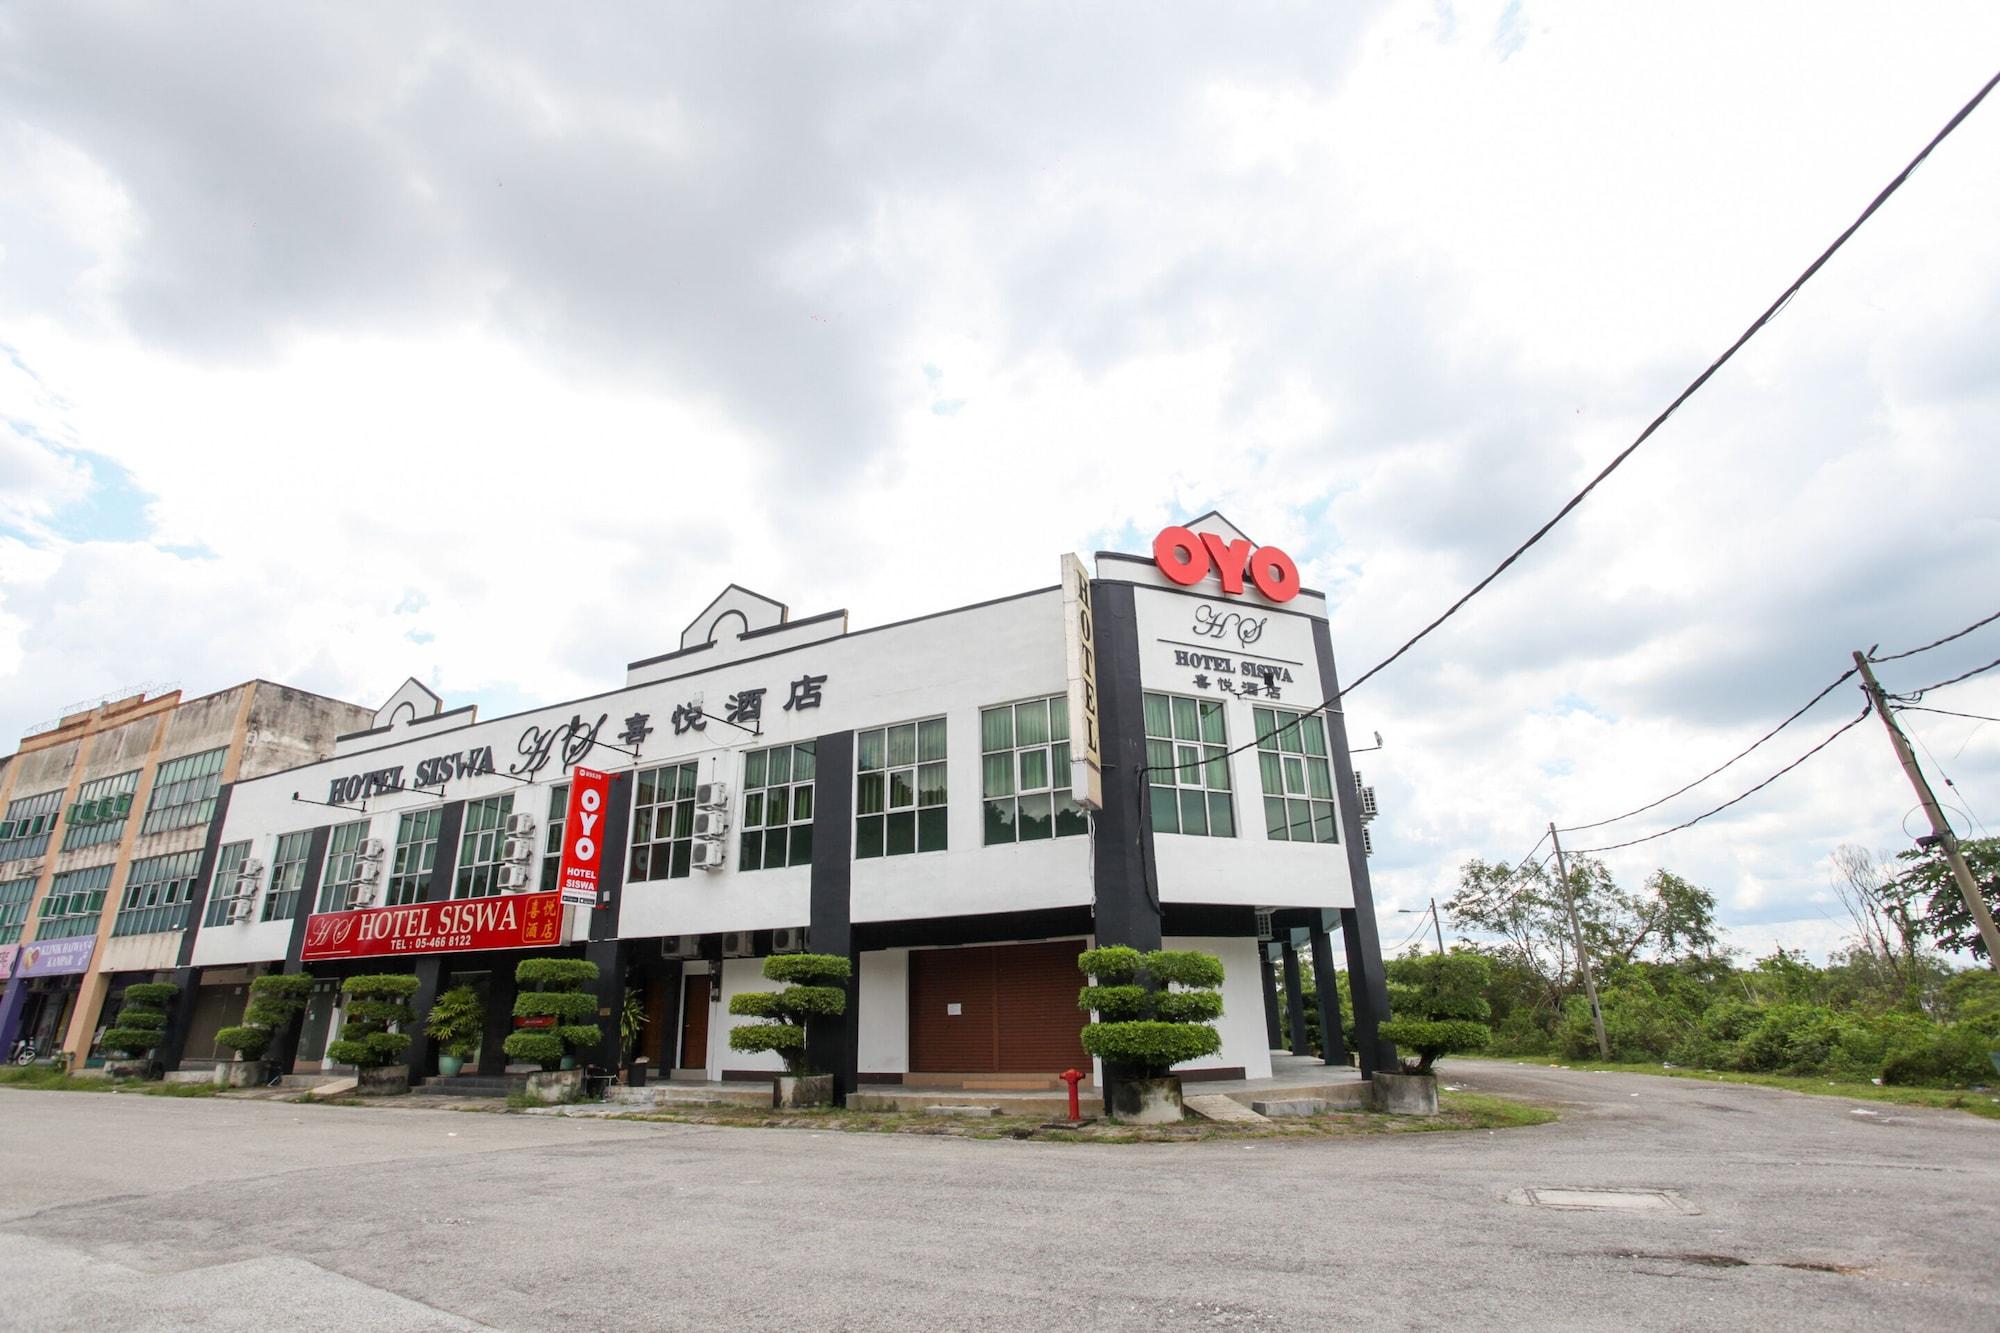 OYO 89539 Hotel Siswa, Kinta